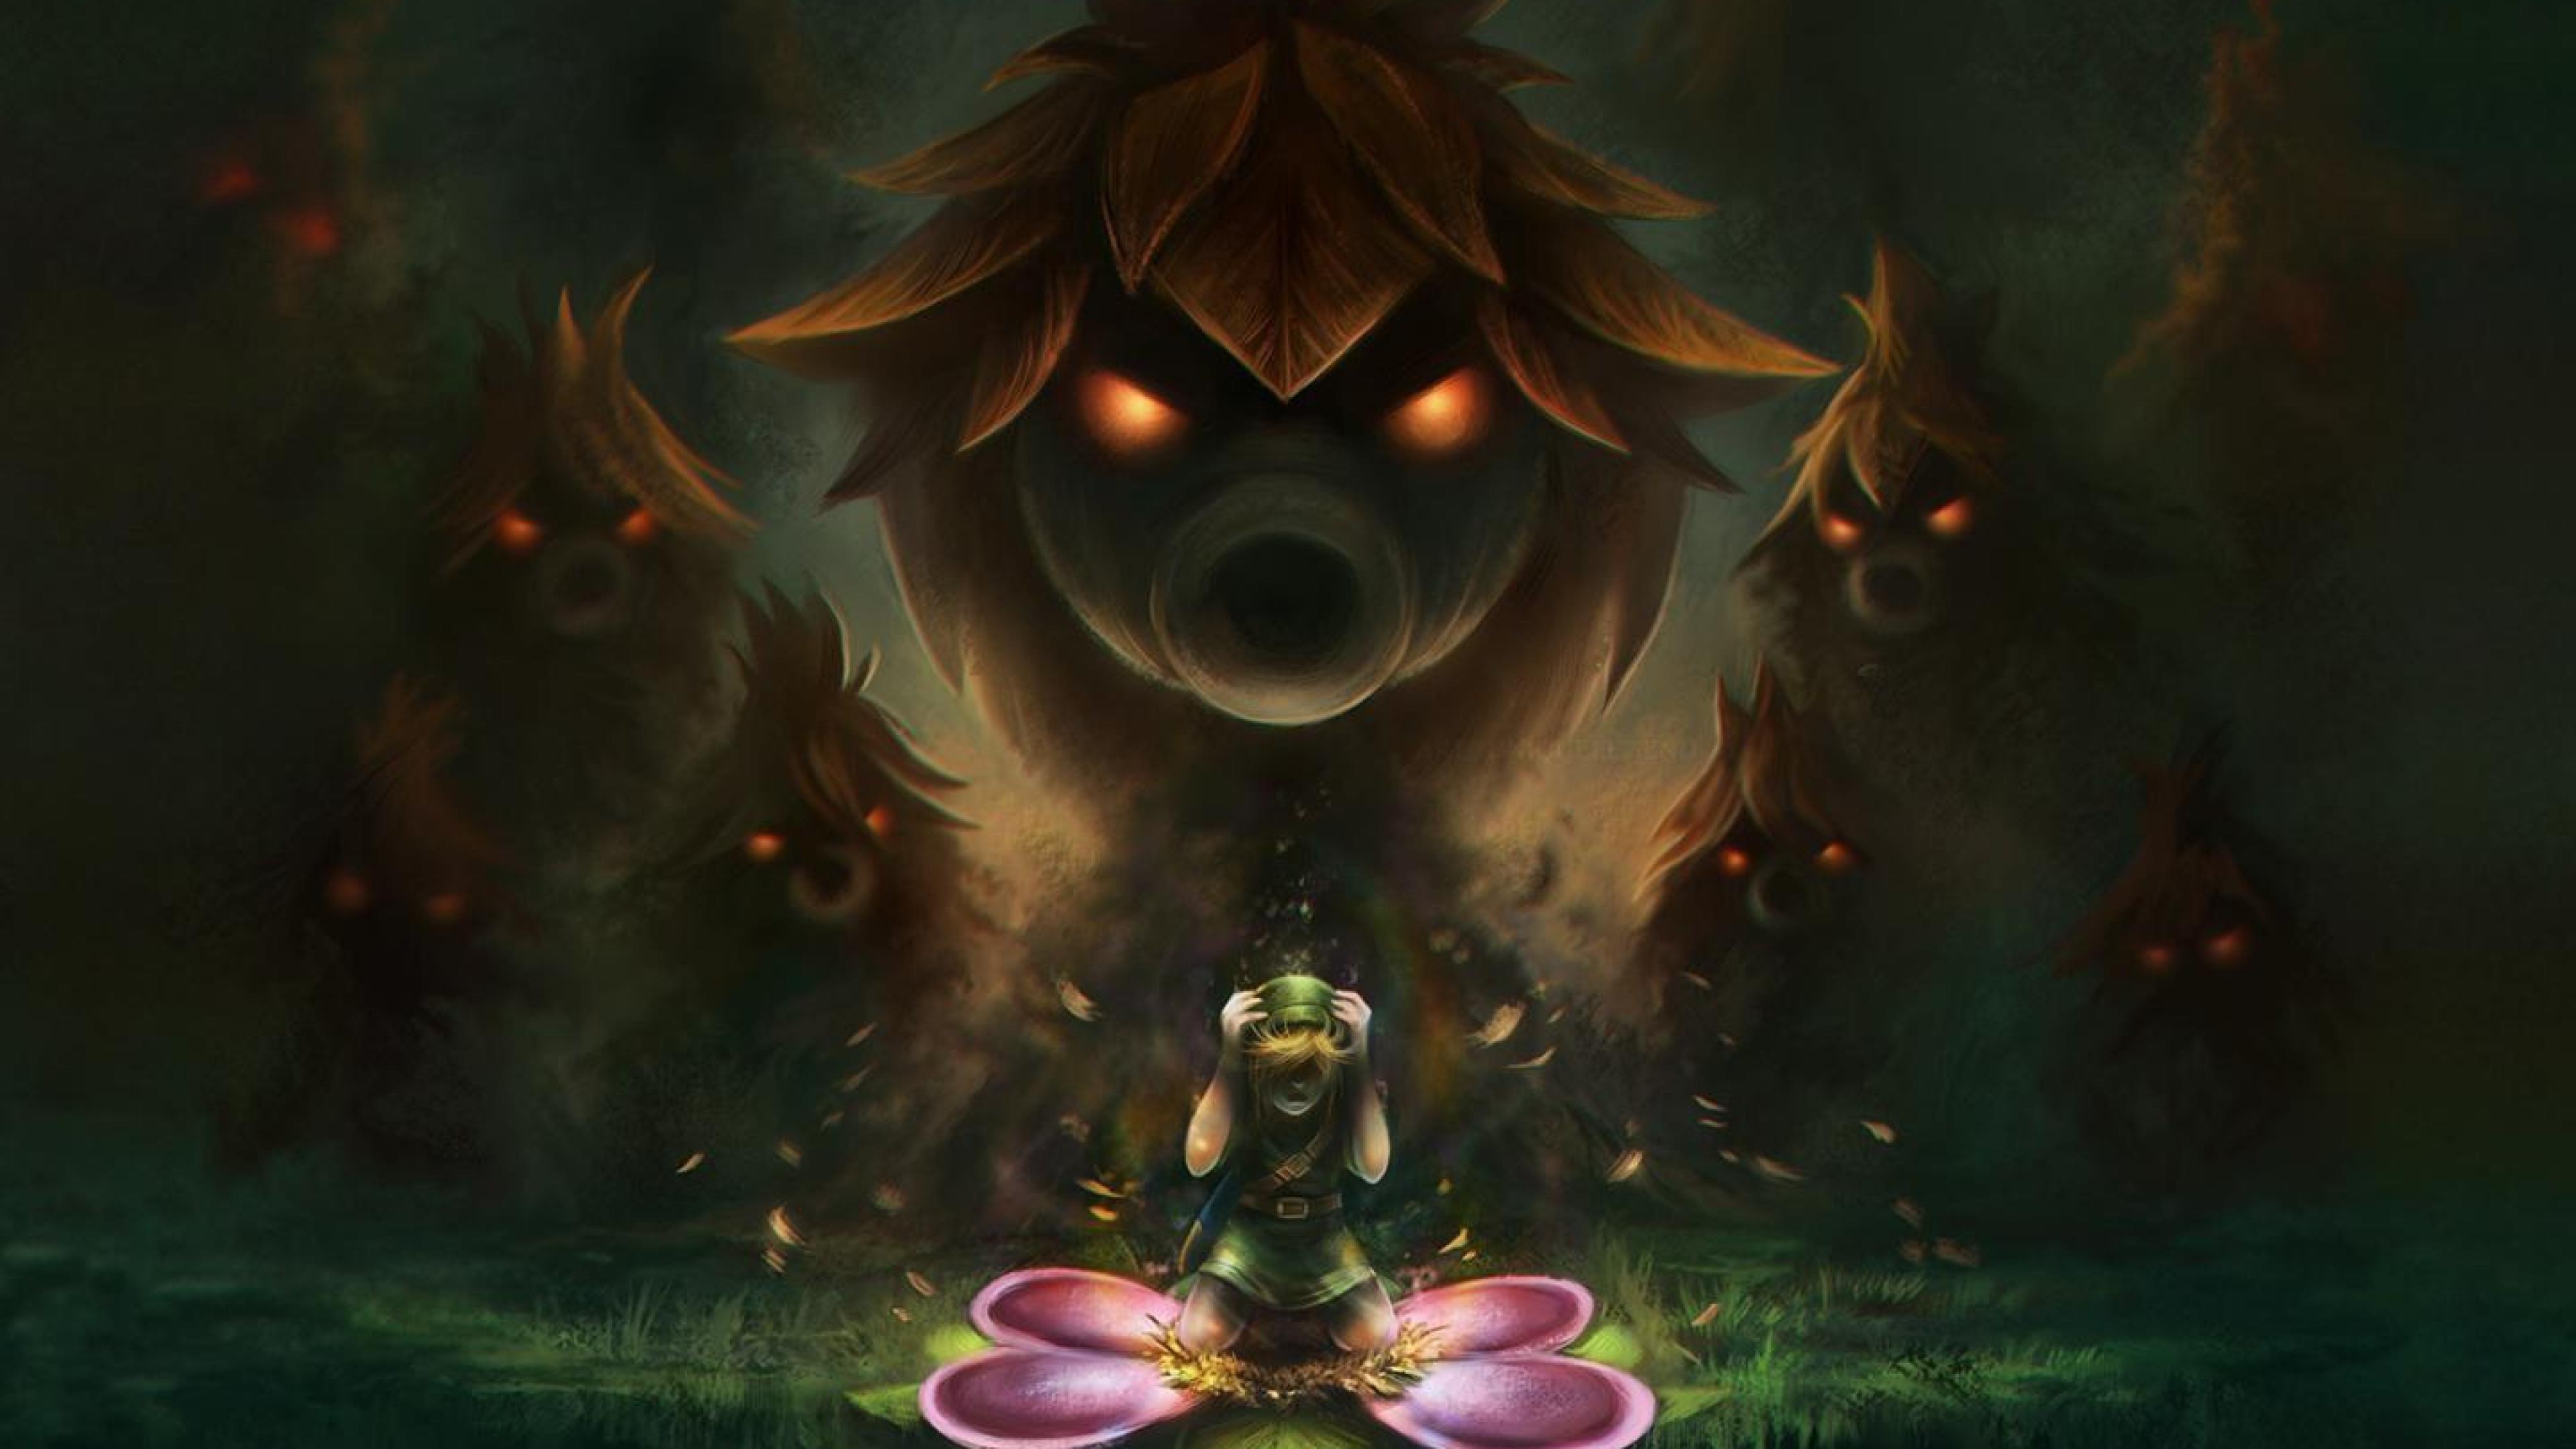 The Legend of Zelda HD wallpaper Die legende von zelda